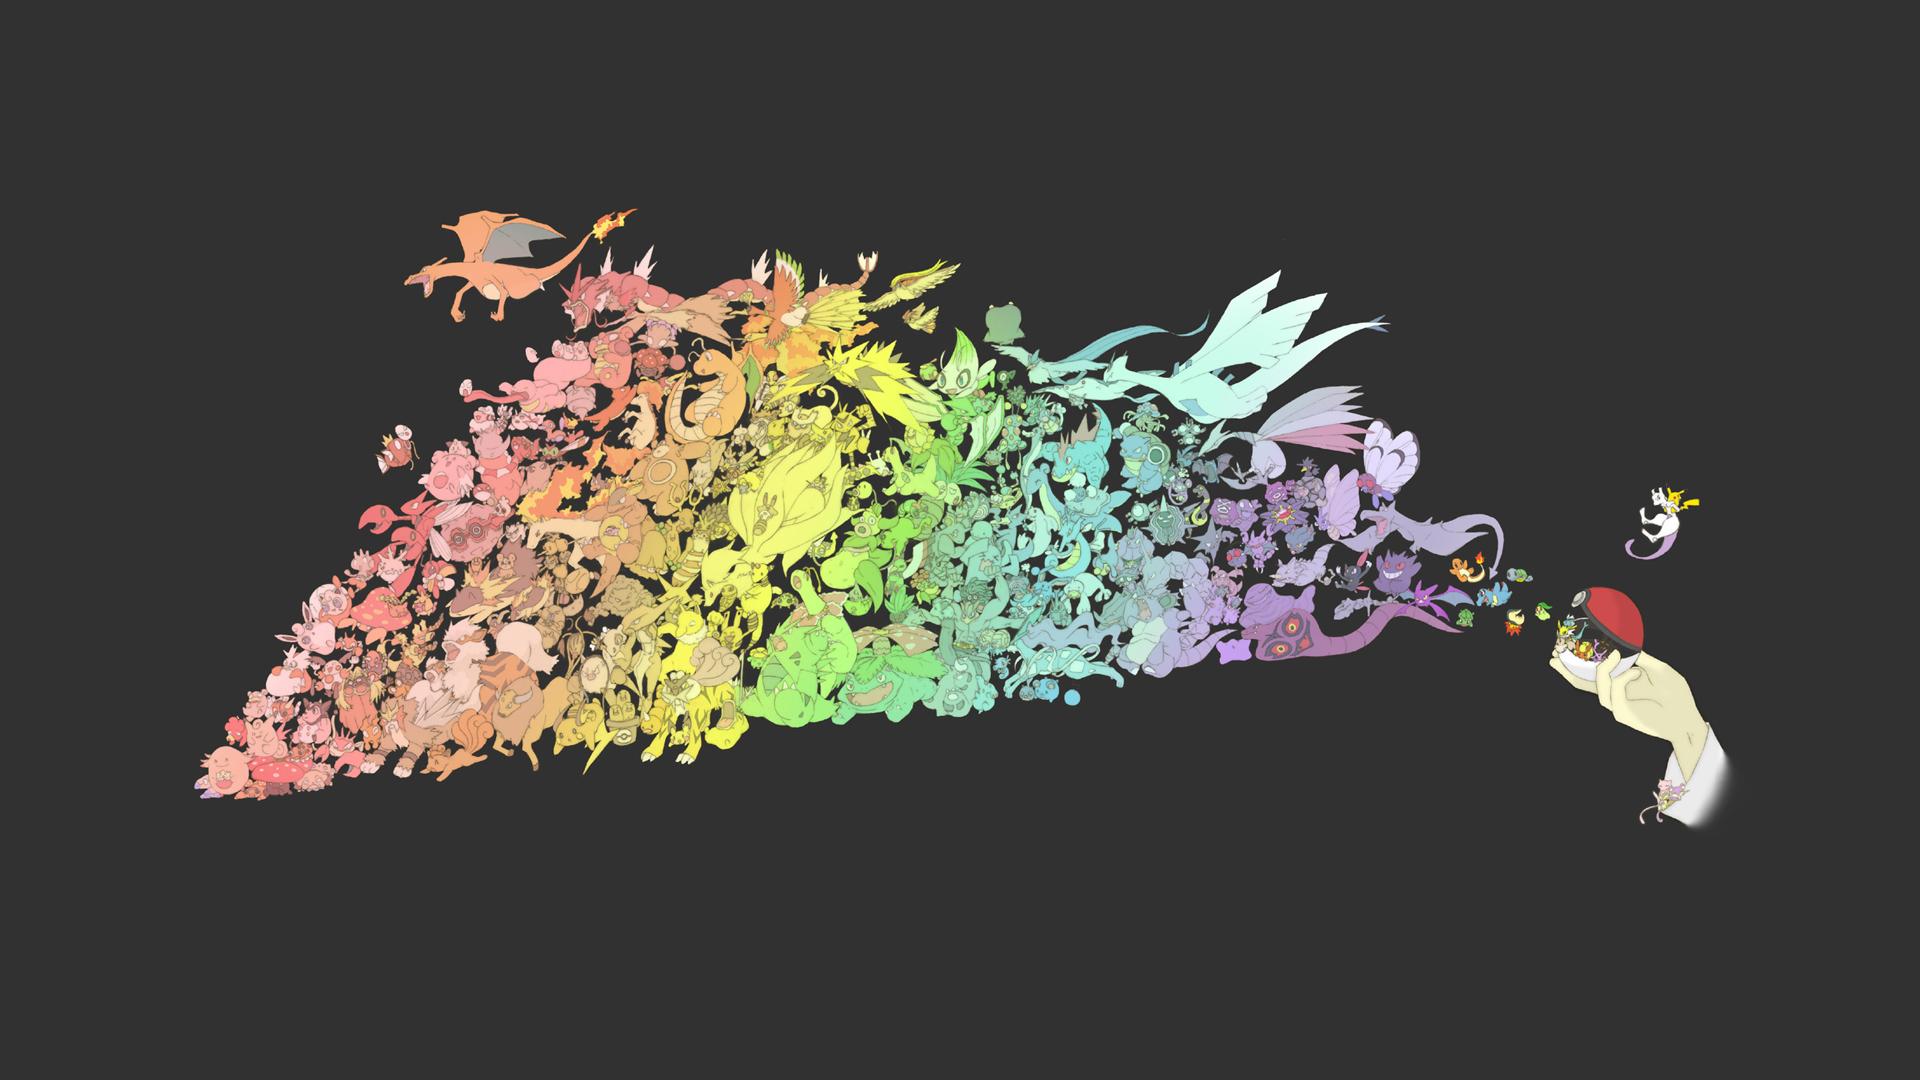 pokémon hd wallpaper background image 1920x1080 id 332658